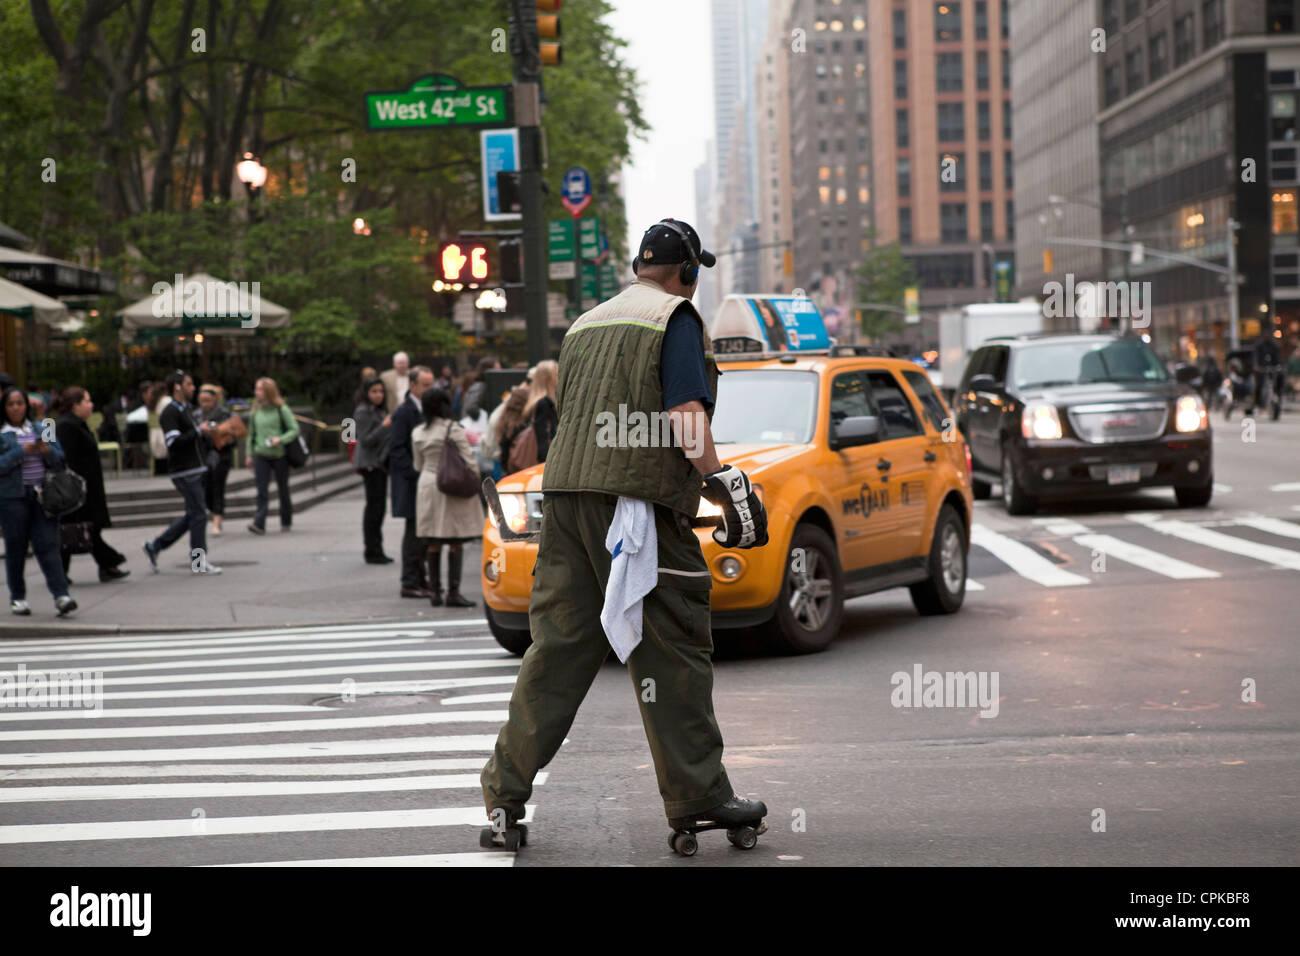 Roller skates york - A Man Wearing Hockey Gear Roller Skates In The Street In New York City